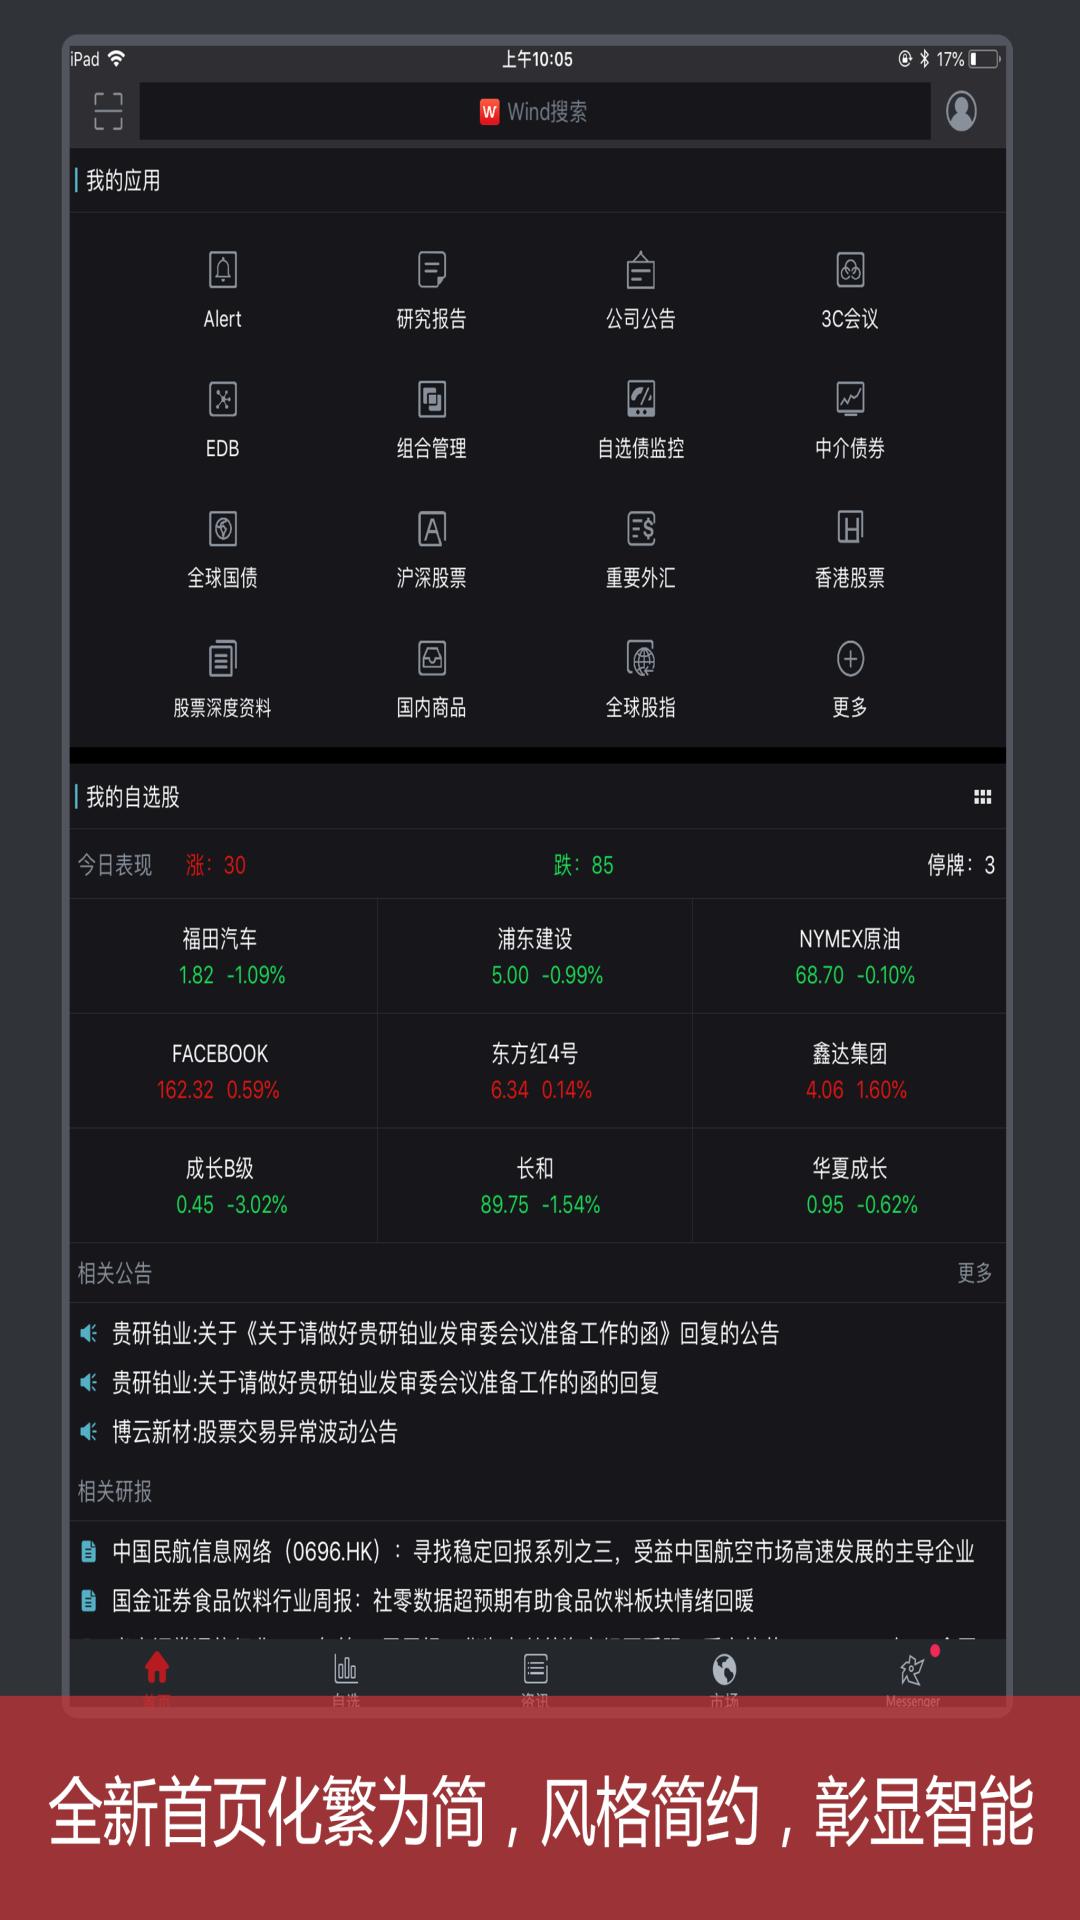 Wind金融终端 V5.0.1.0 安卓版截图5